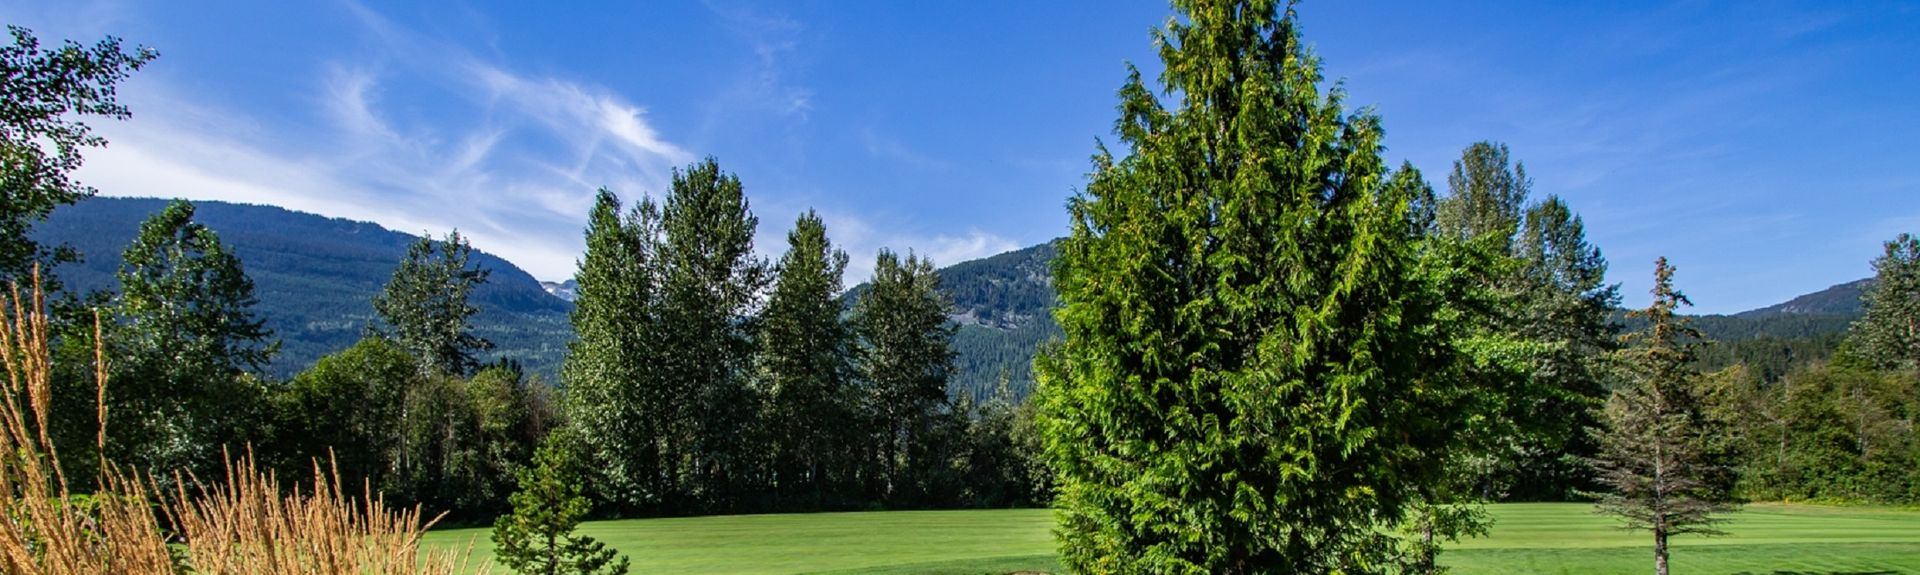 Nicklaus North, Whistler, British Columbia, Kanada